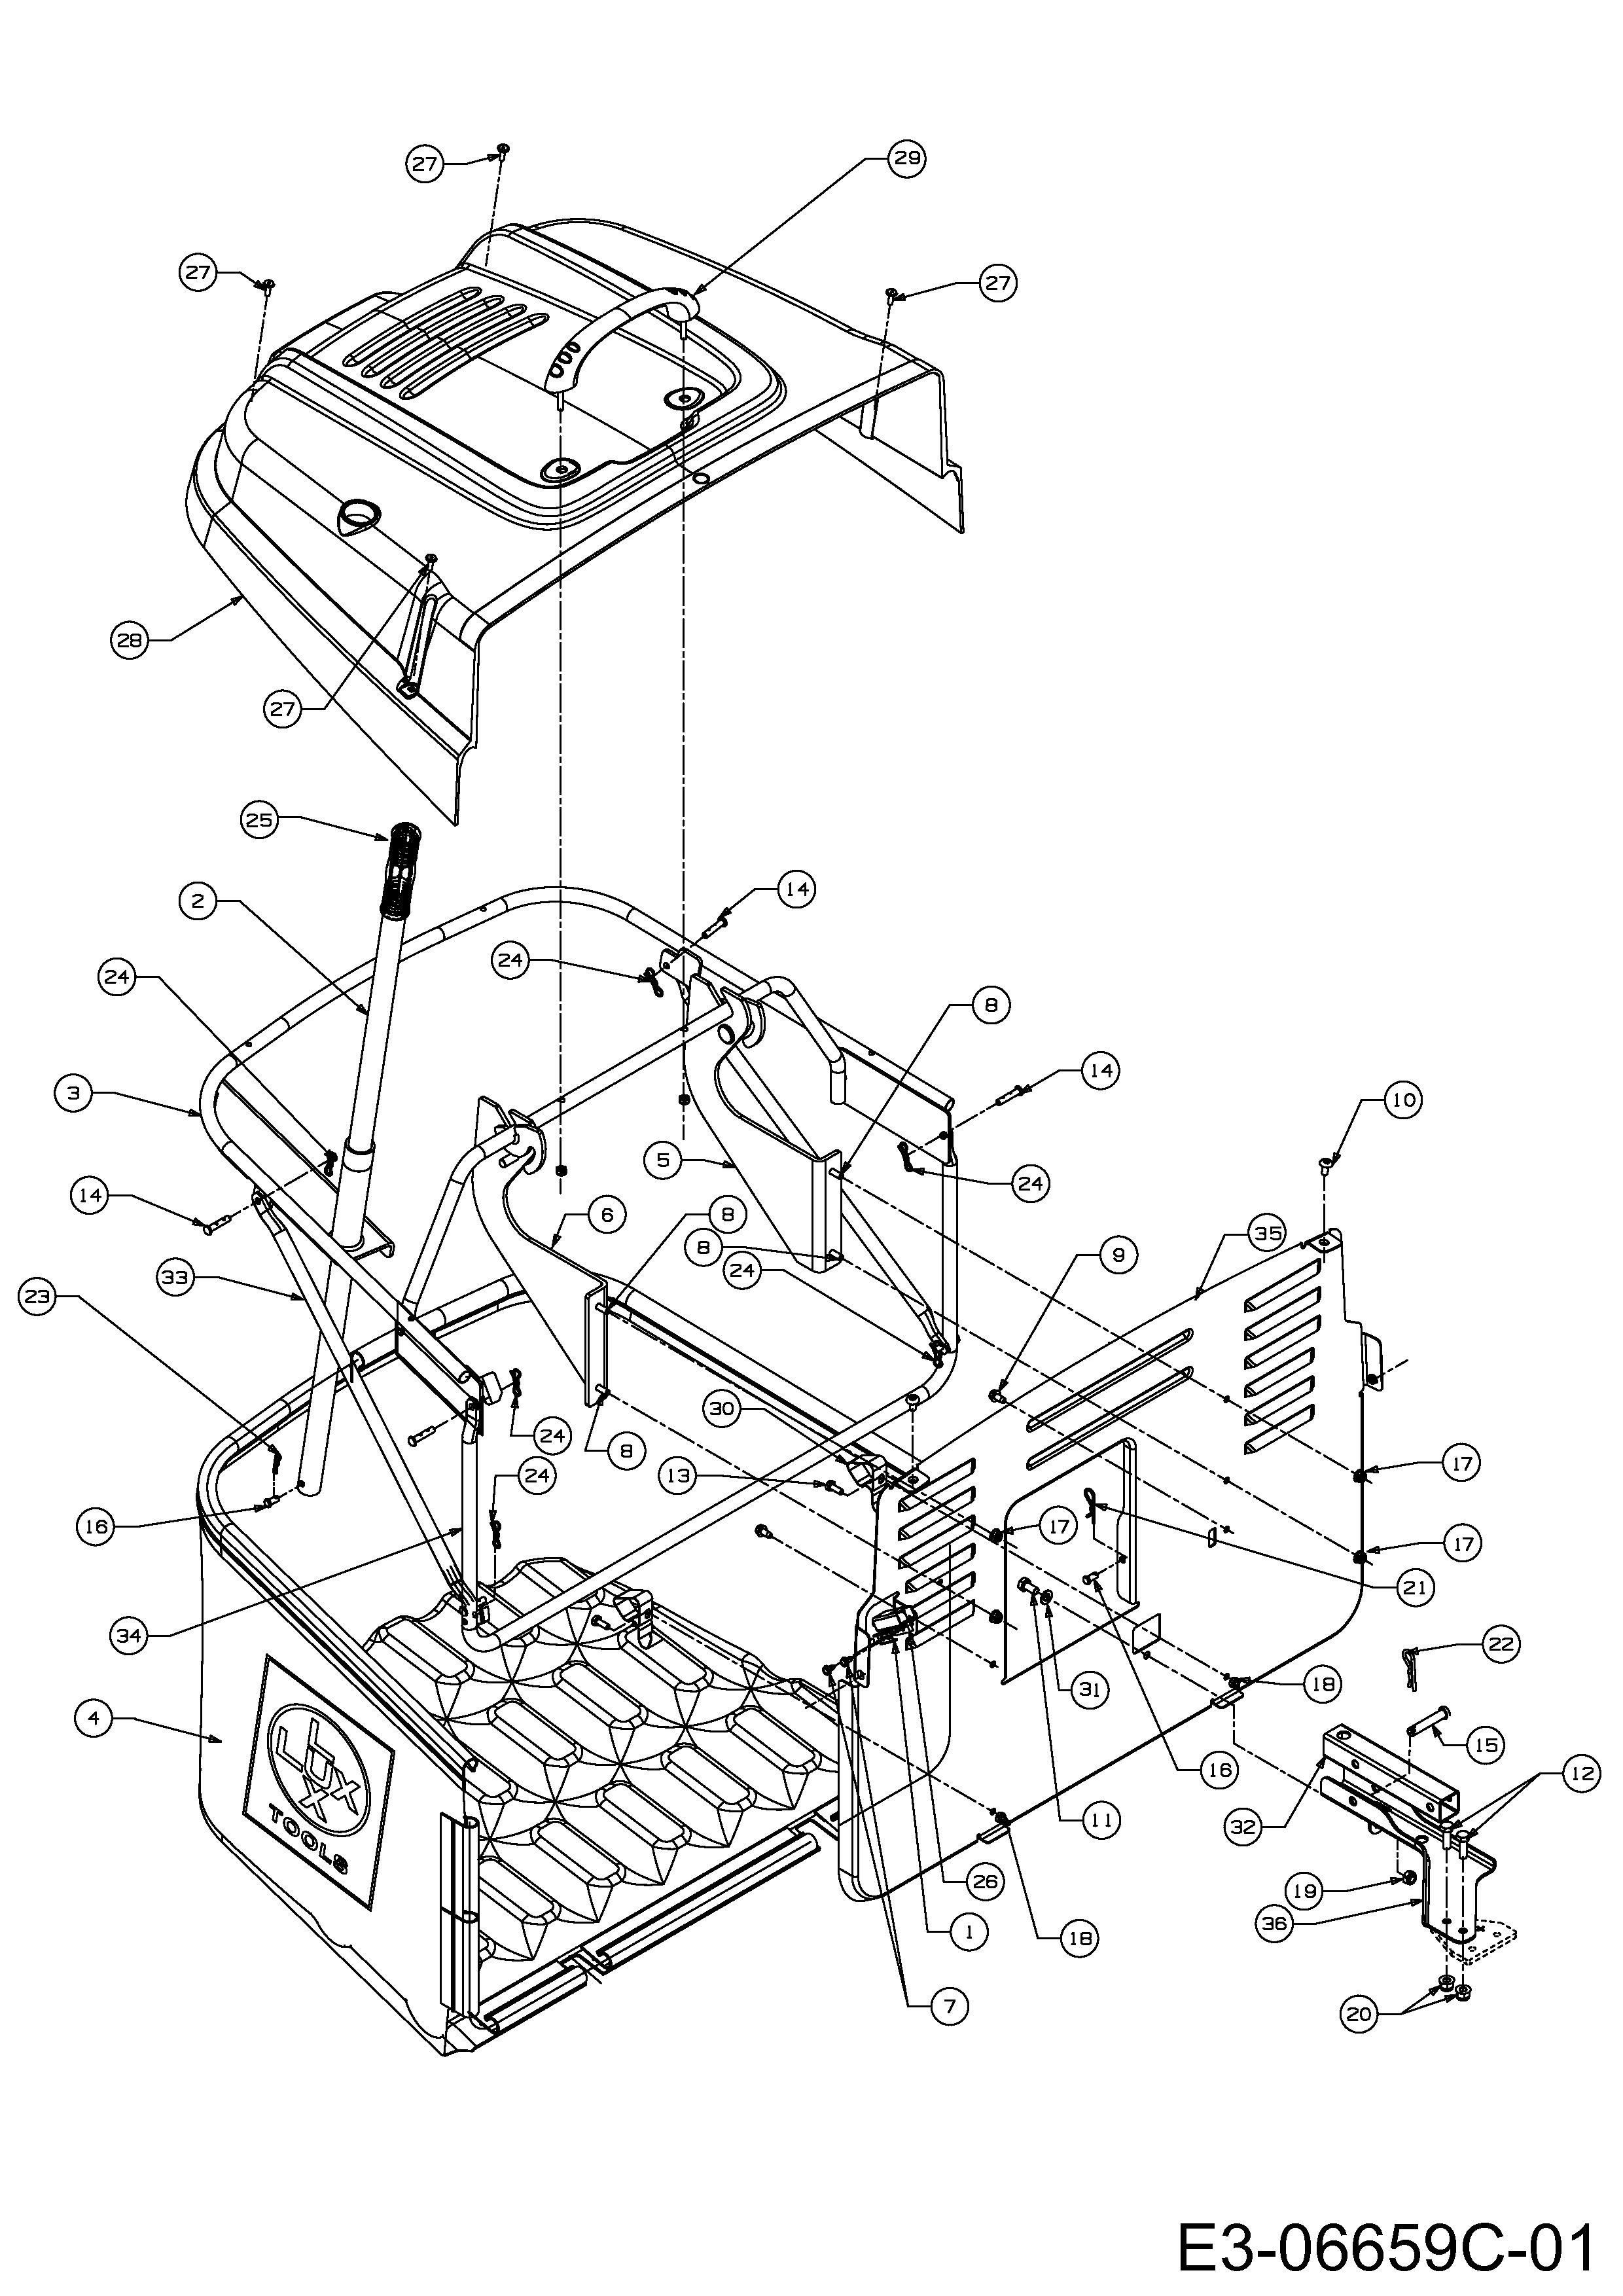 Grasfangvorrichtung, 13HM77TE694 (2014), RT 155-92 H